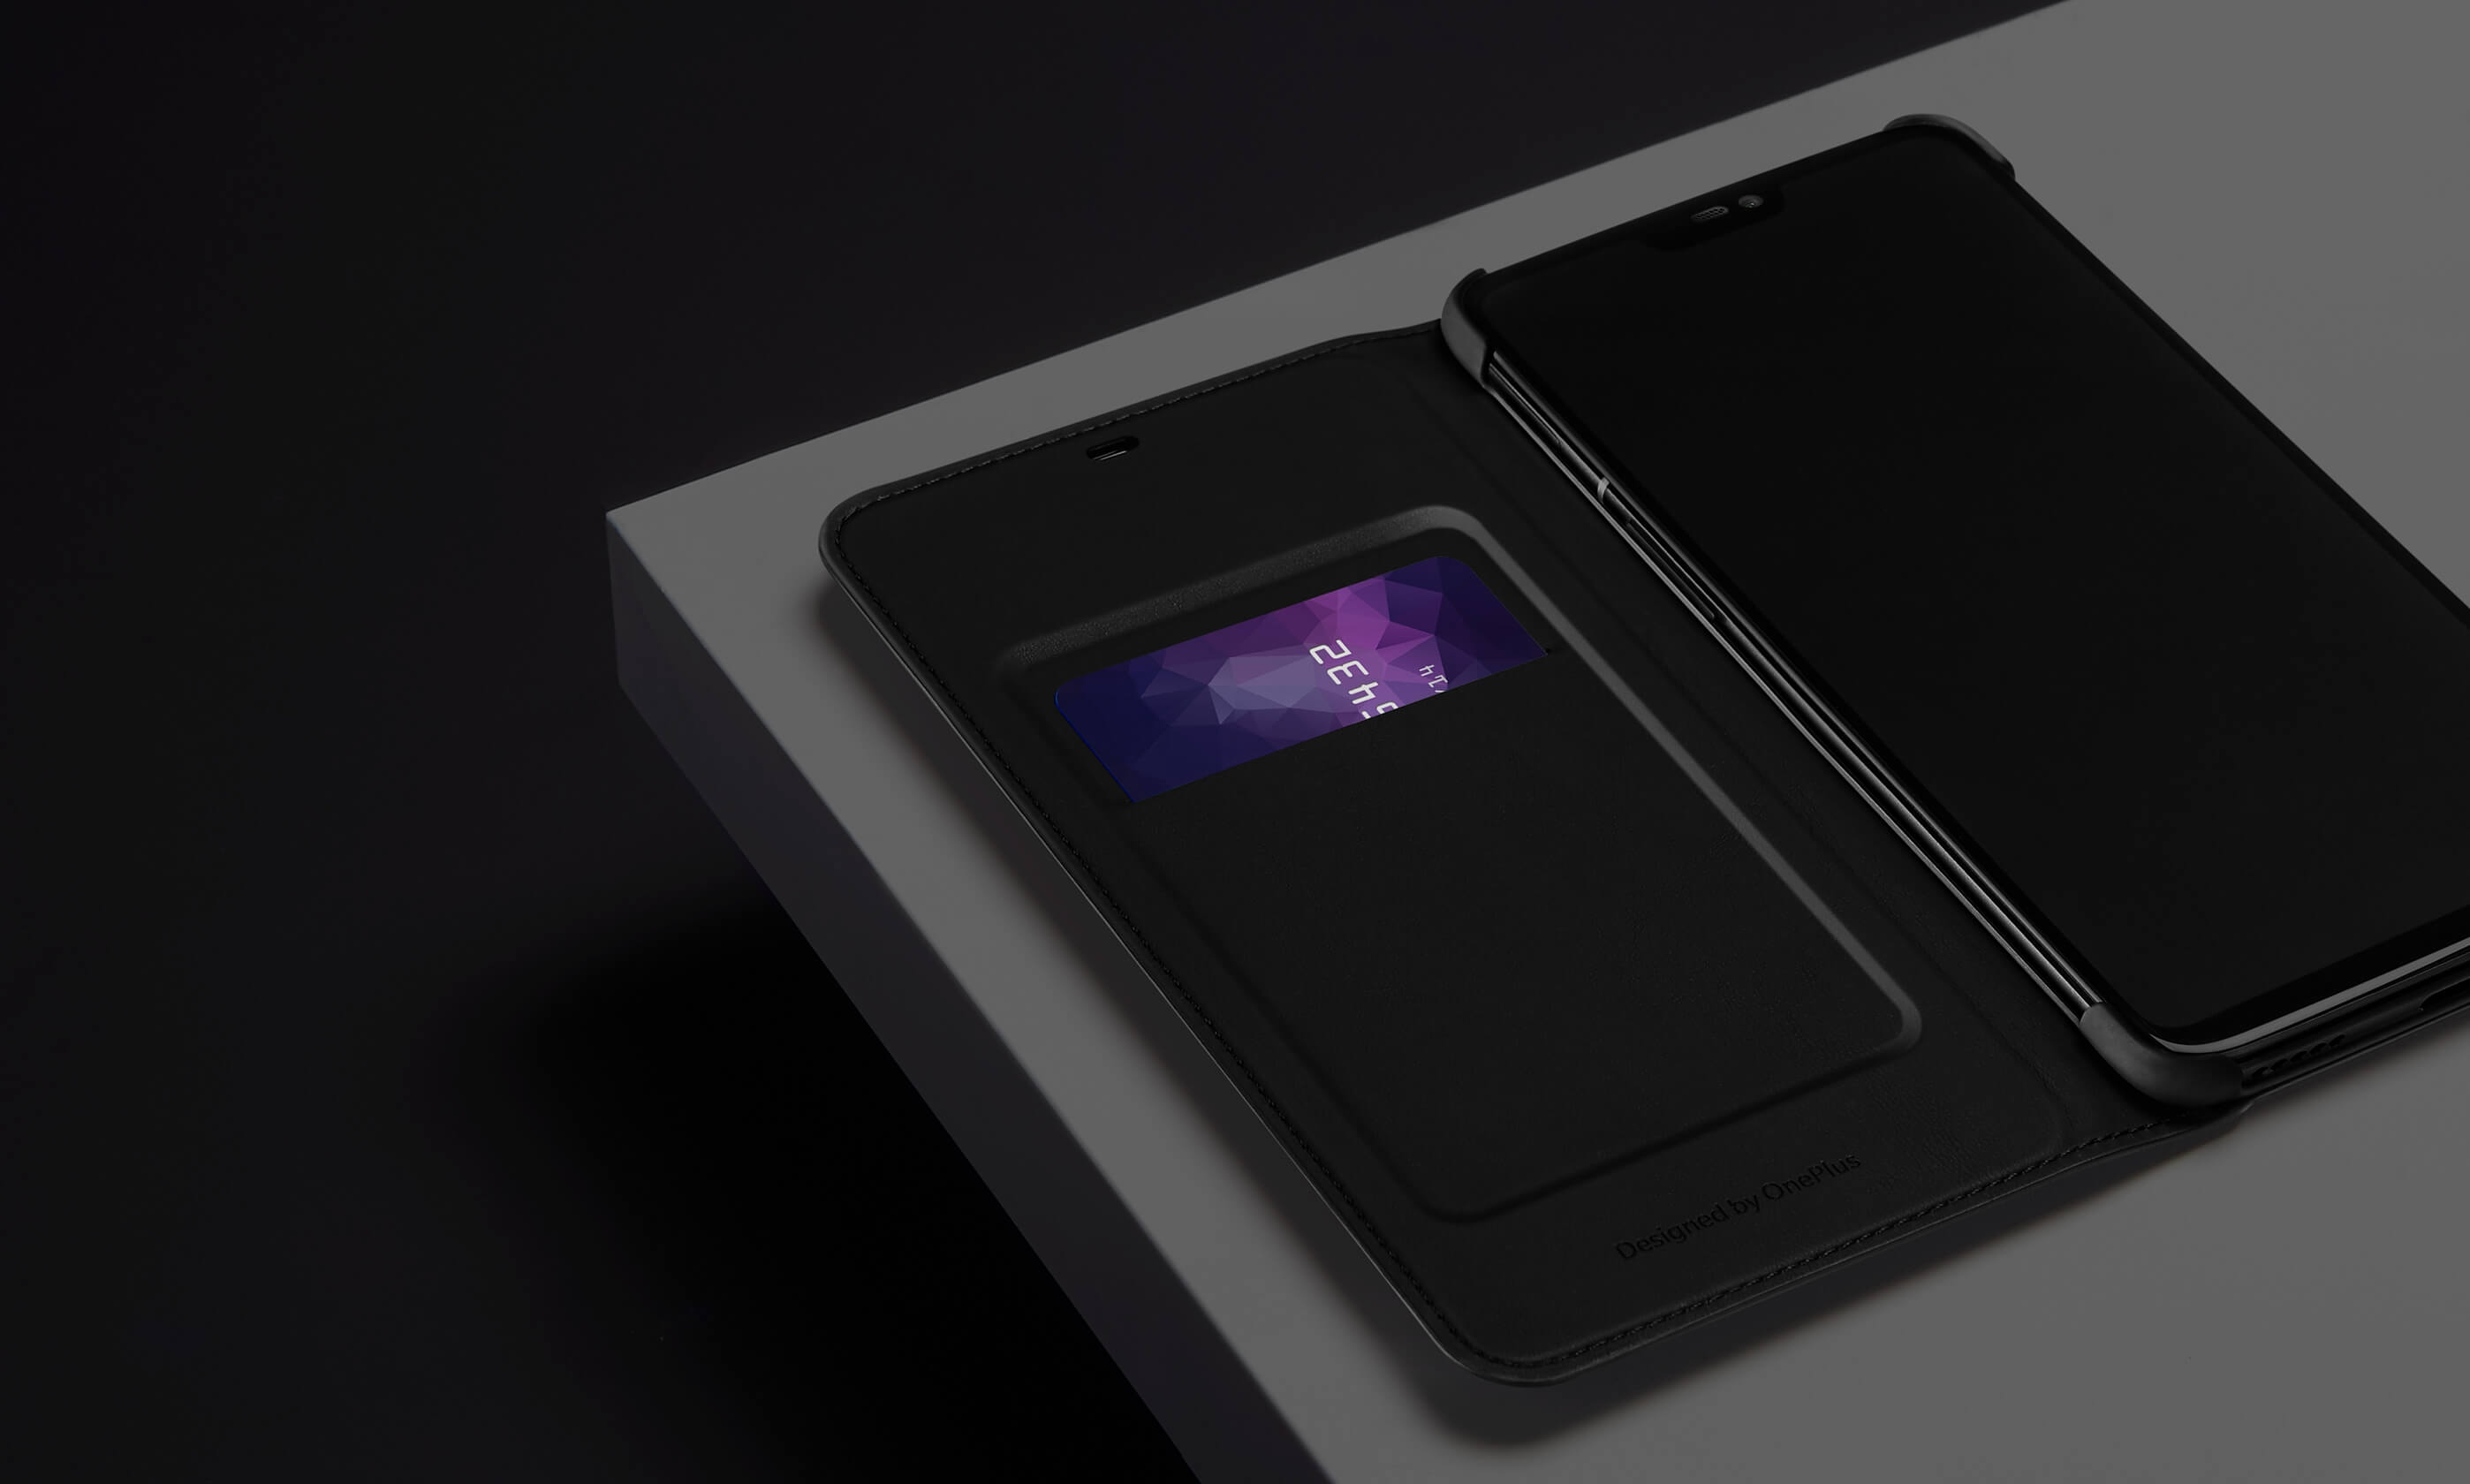 OnePlus 6 Flip Cover